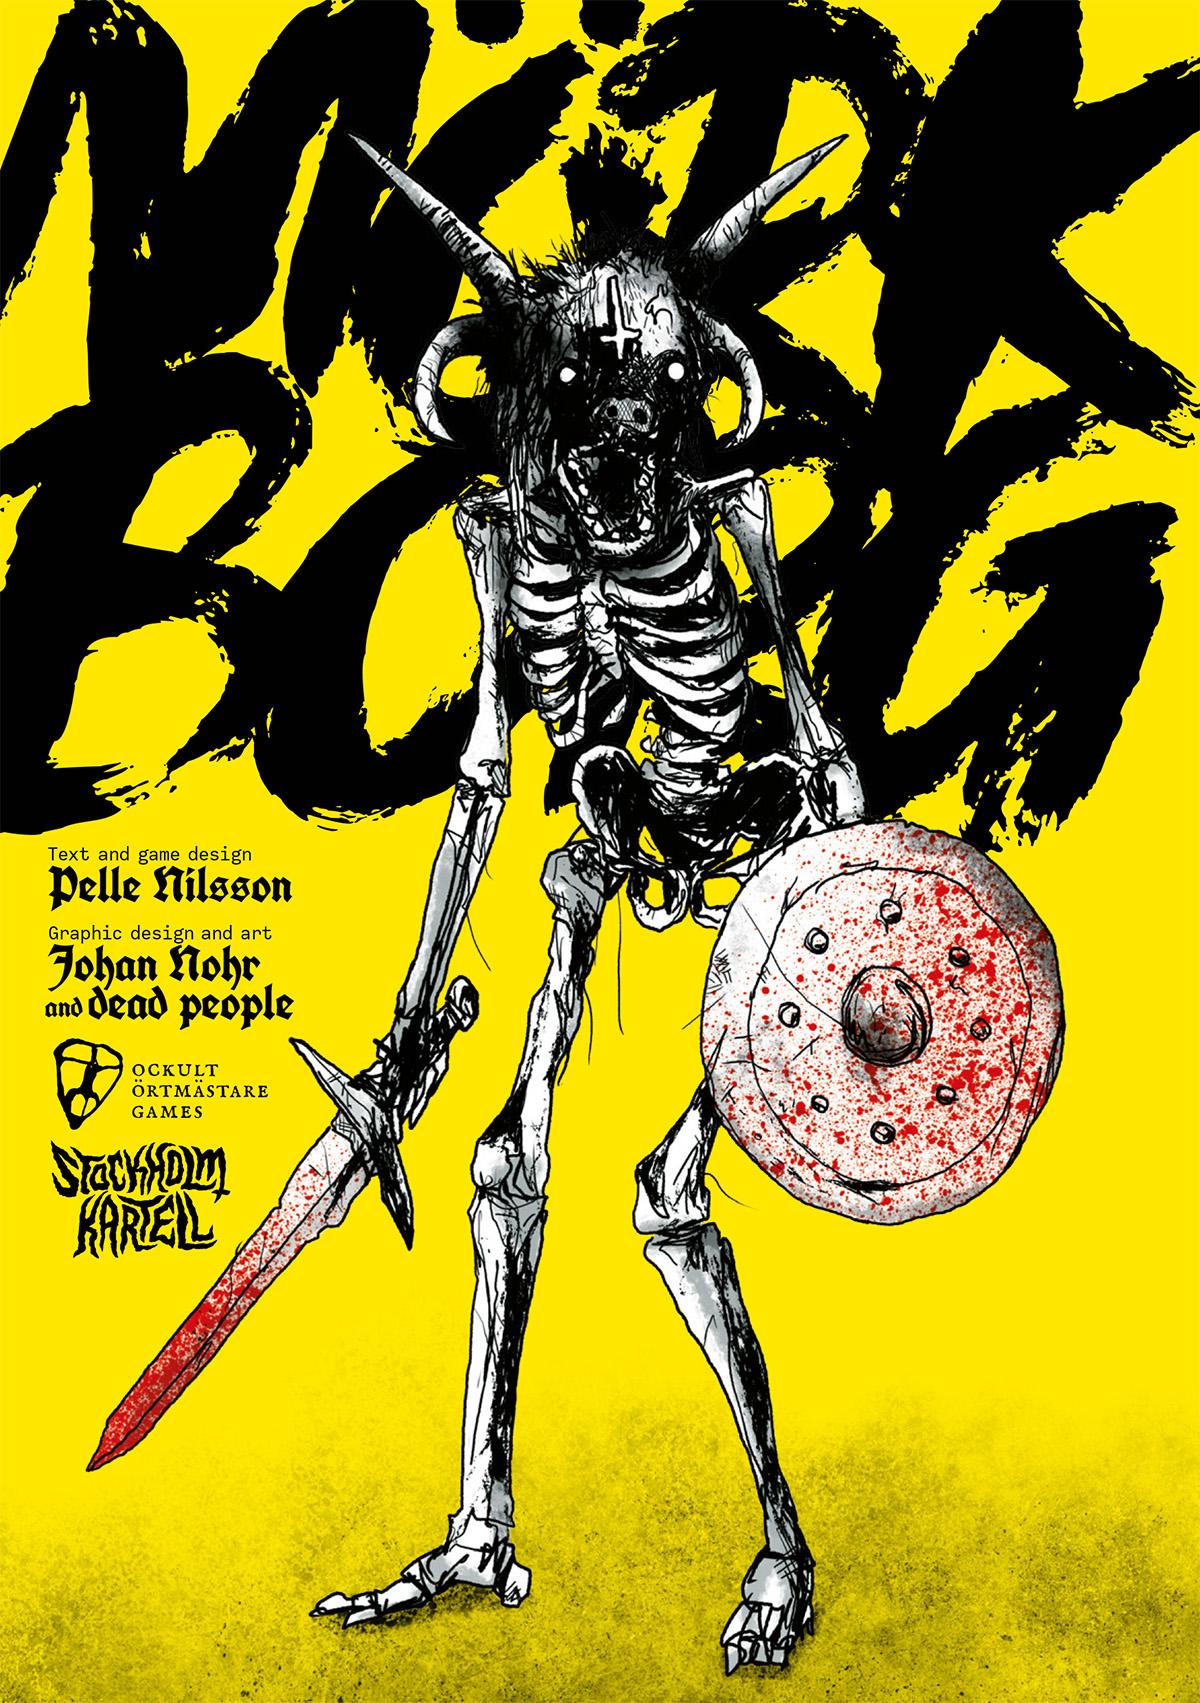 MörK Borg front